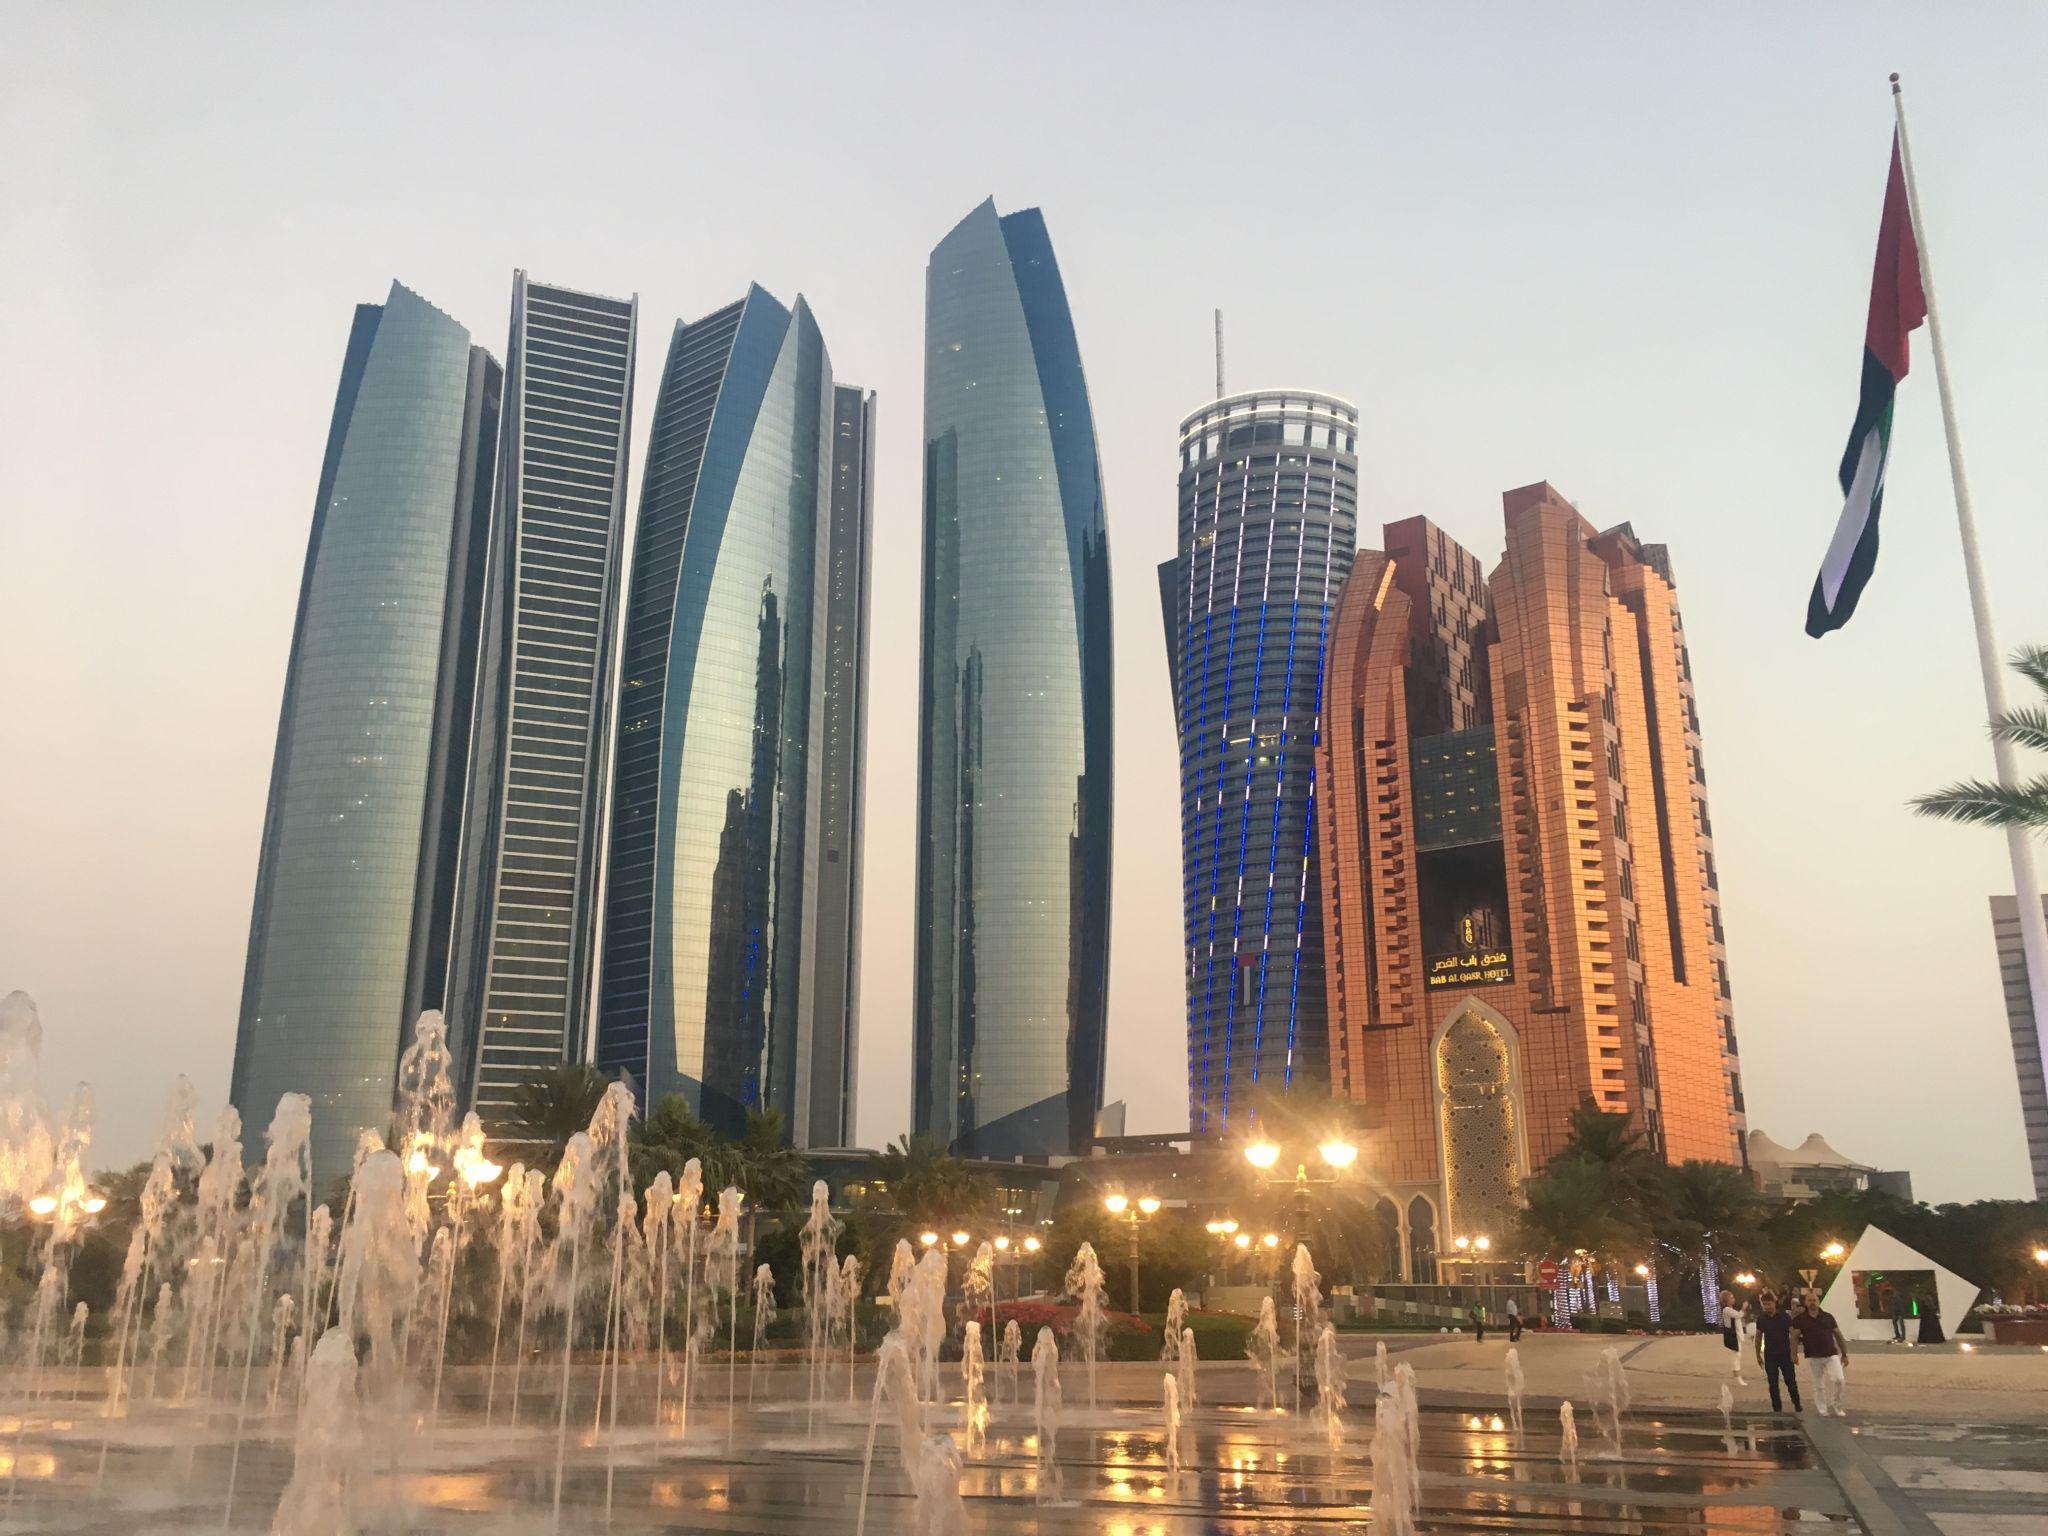 Abu Dhabi skyline and Etihad Towers